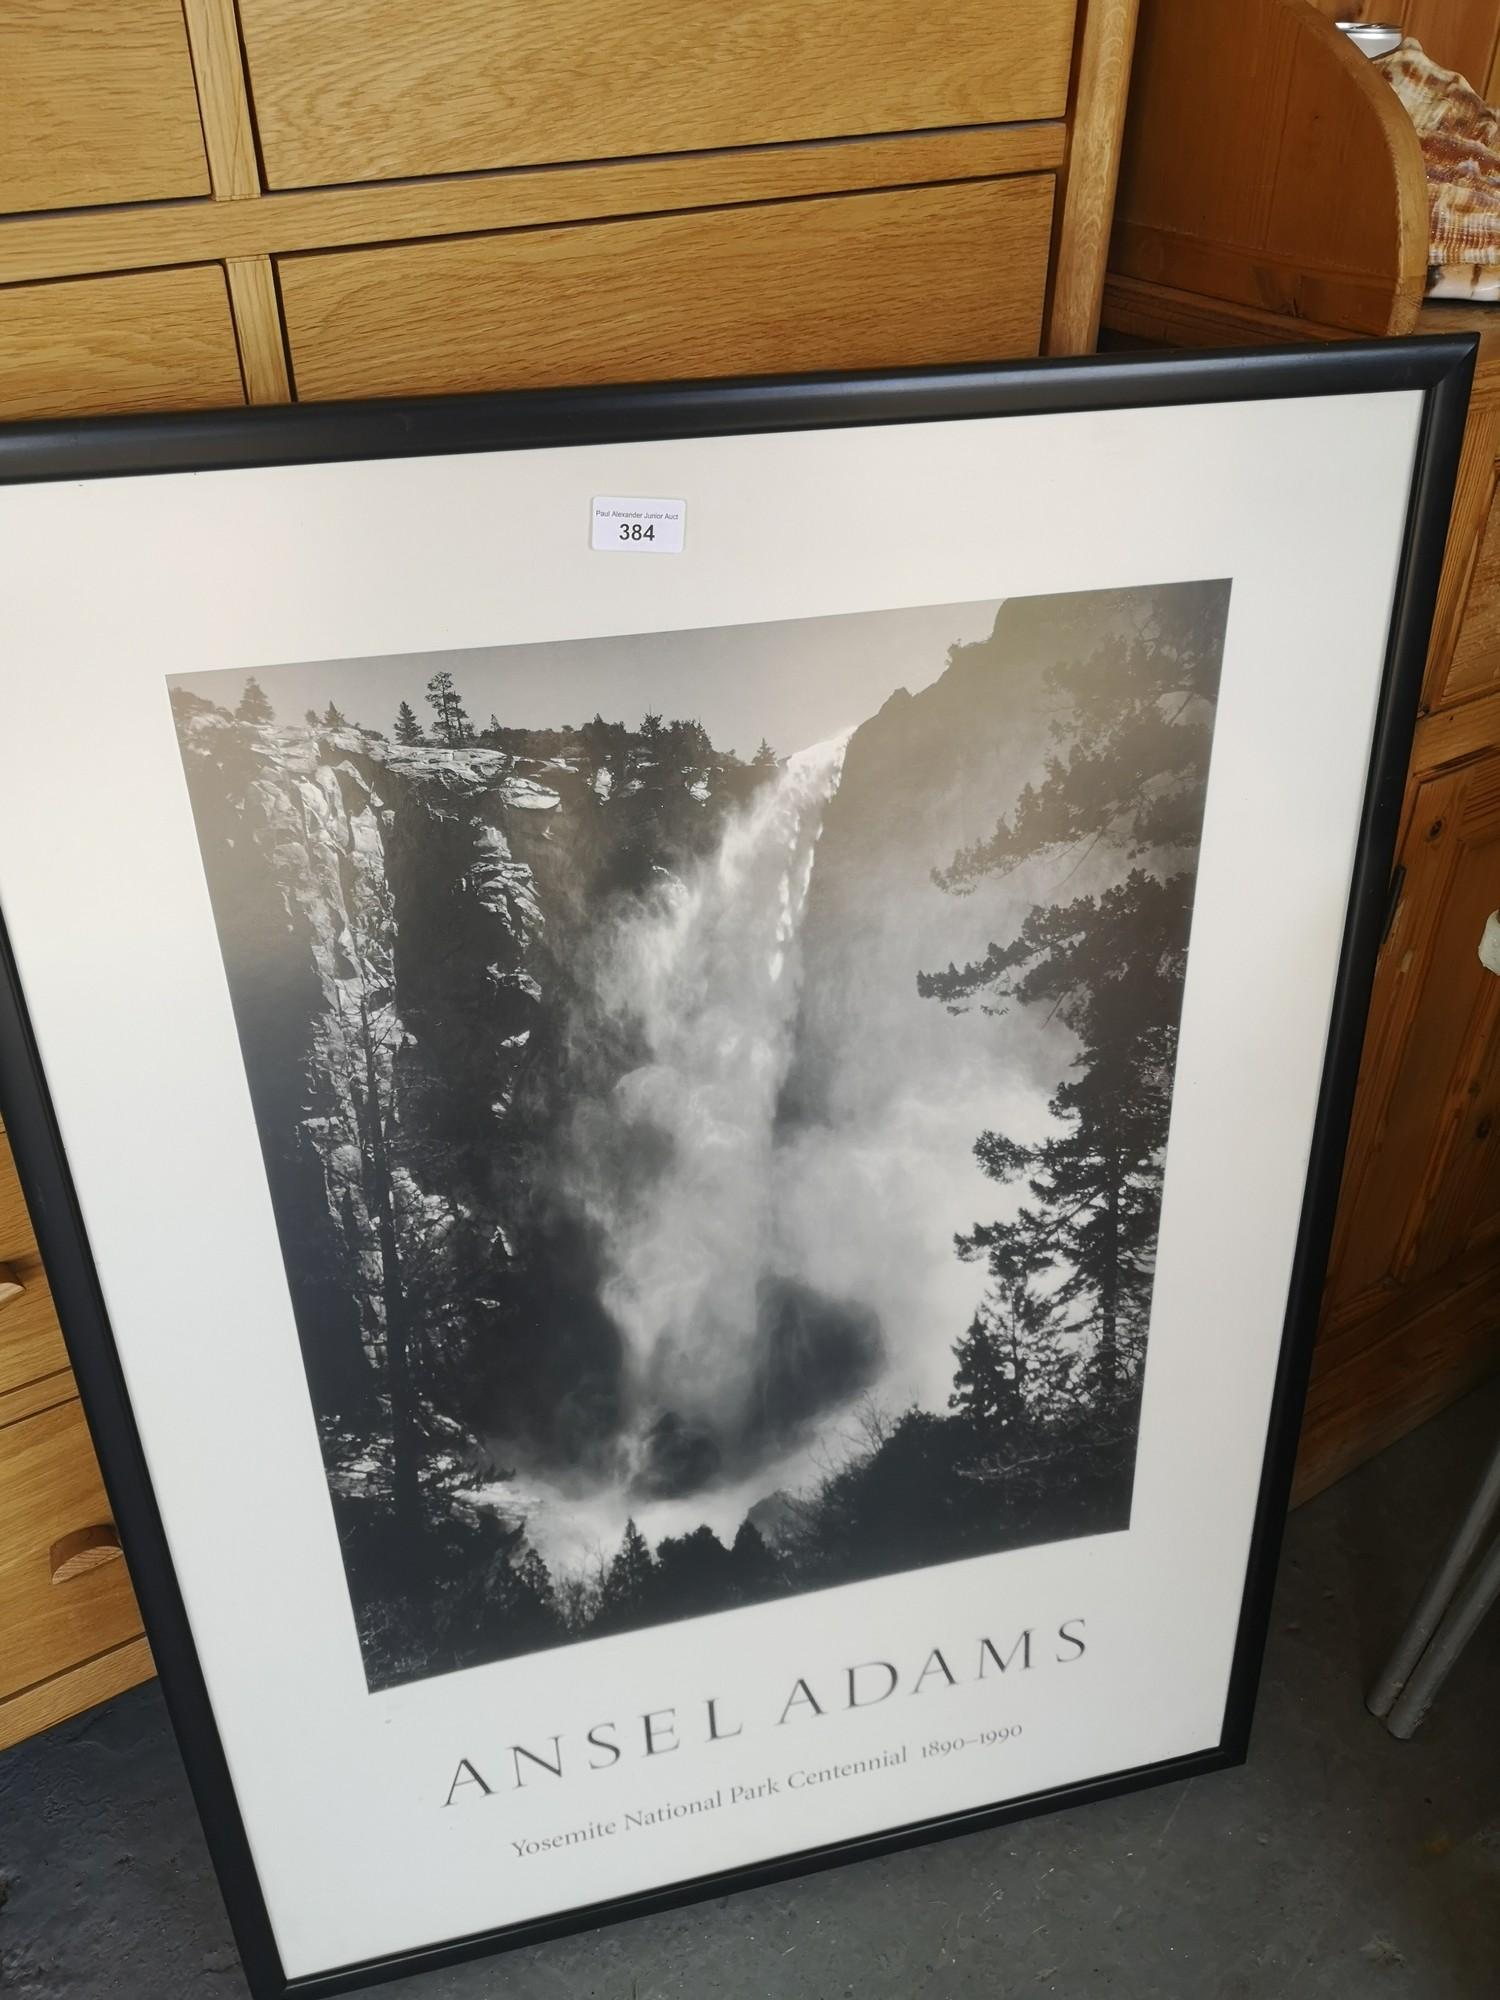 Ansel Adams print in frame. - Image 2 of 2